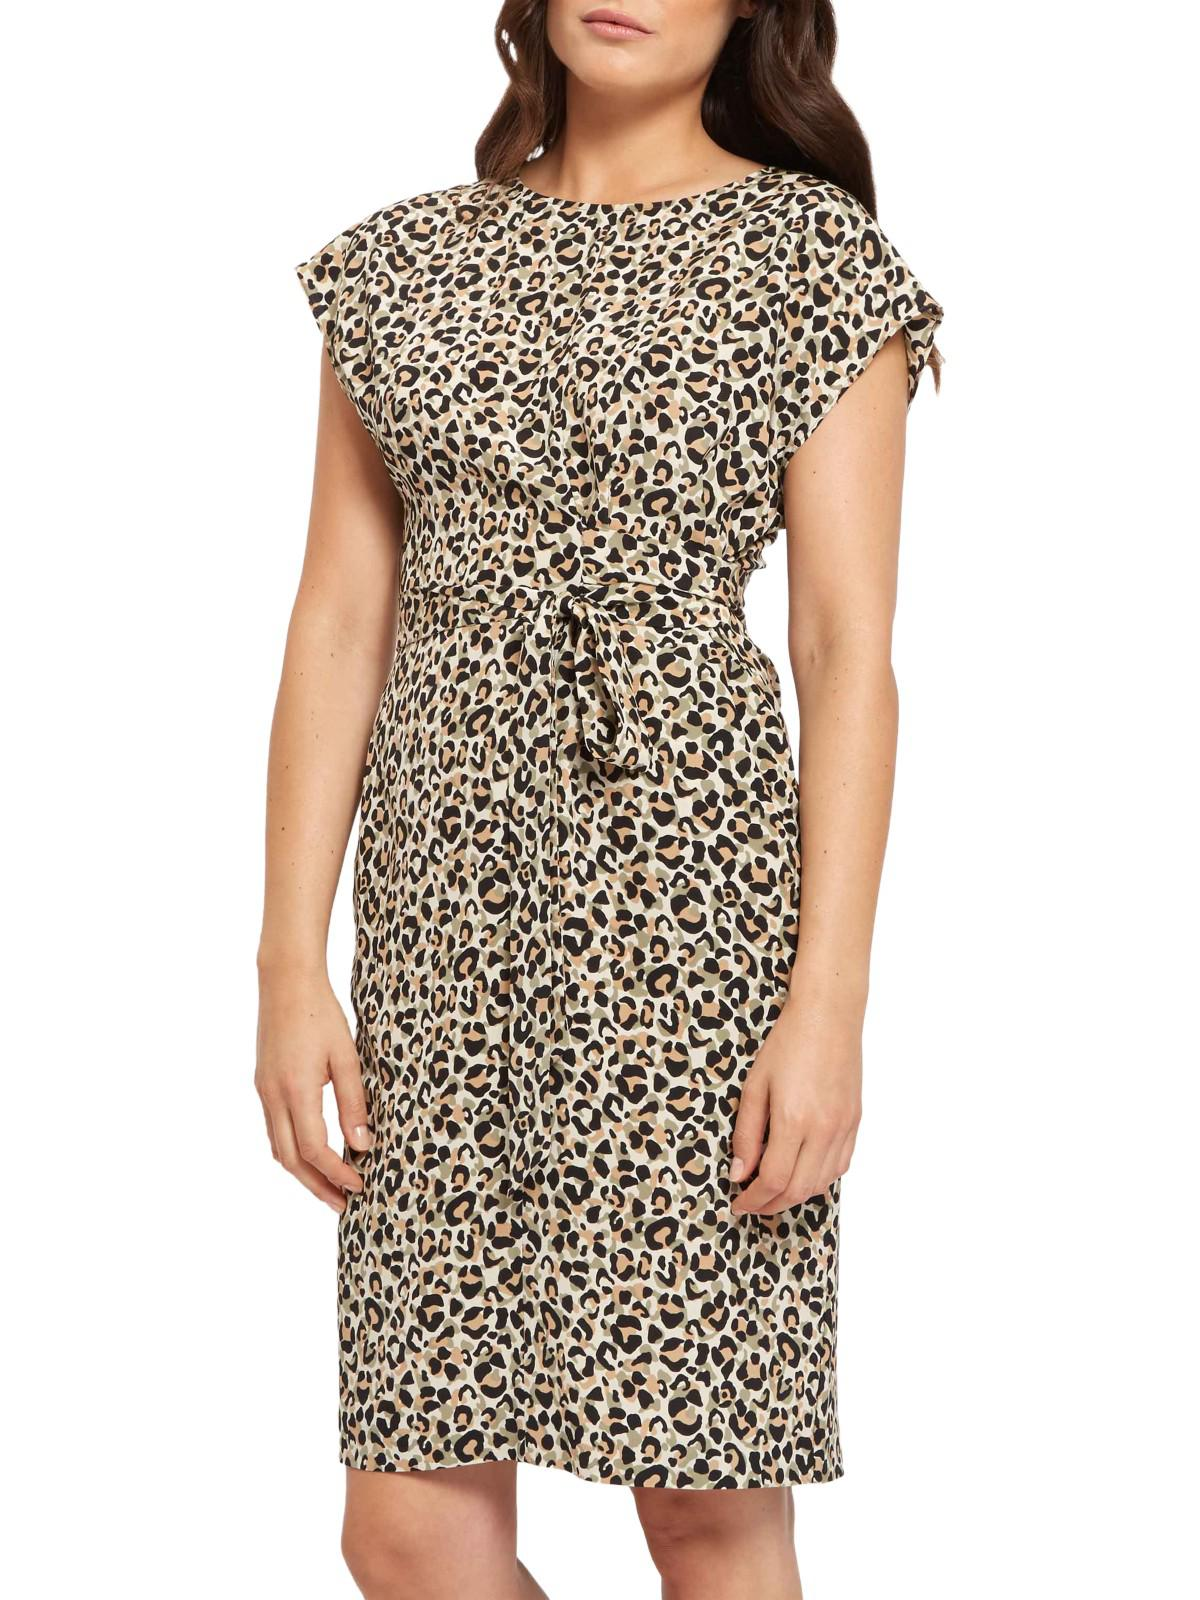 Jaeger Silk Leopard Print Wrap Dress in Black - Lyst 1ee6c59c8